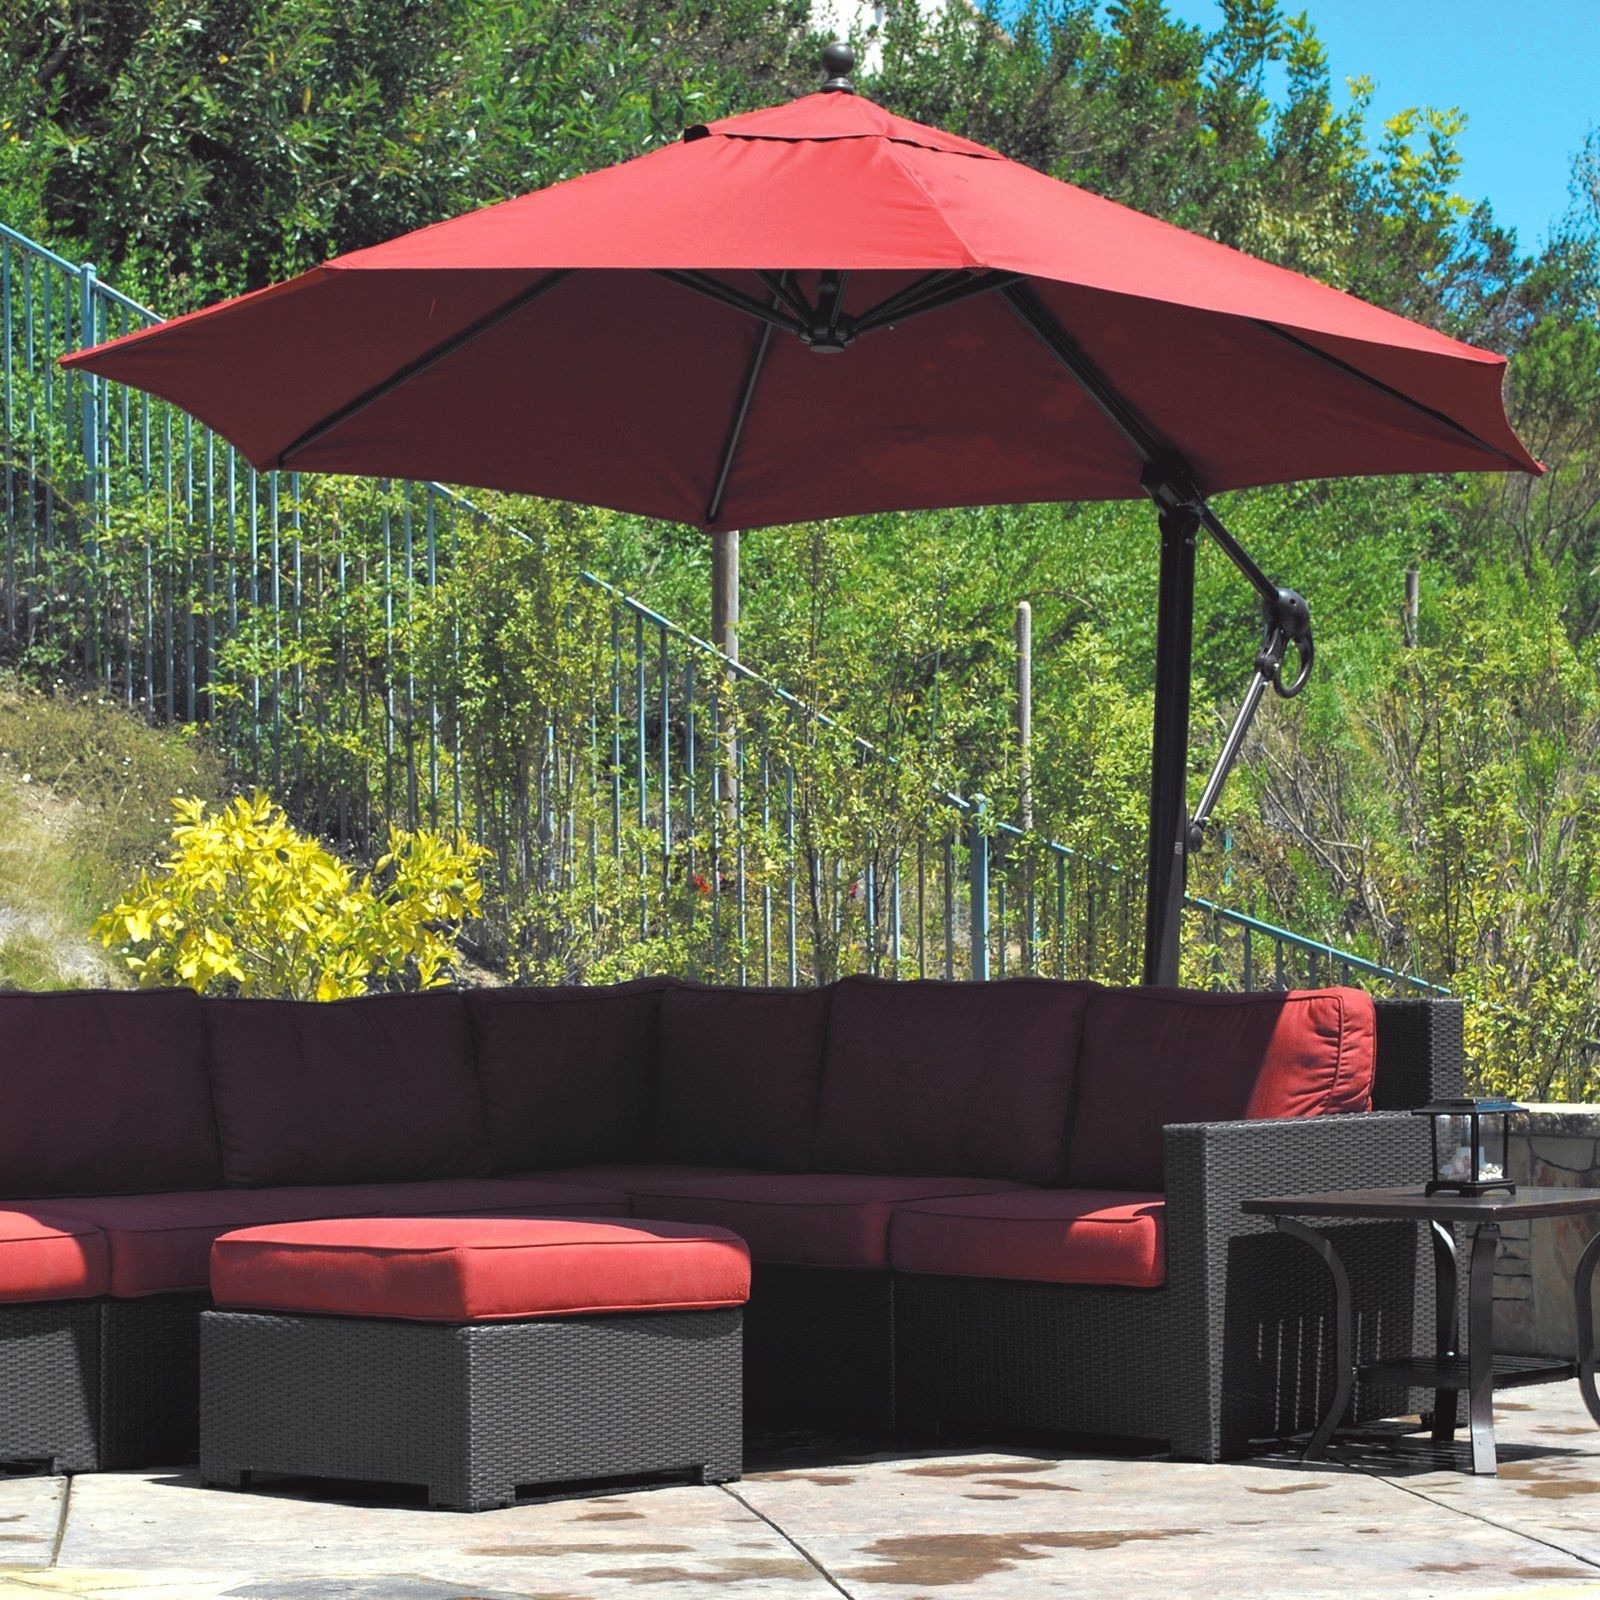 Lowes Patio Umbrellas Inside Newest Lowes Patio Umbrellas Luxury Umbrella Sale Elegant Cool – Home (Gallery 10 of 20)